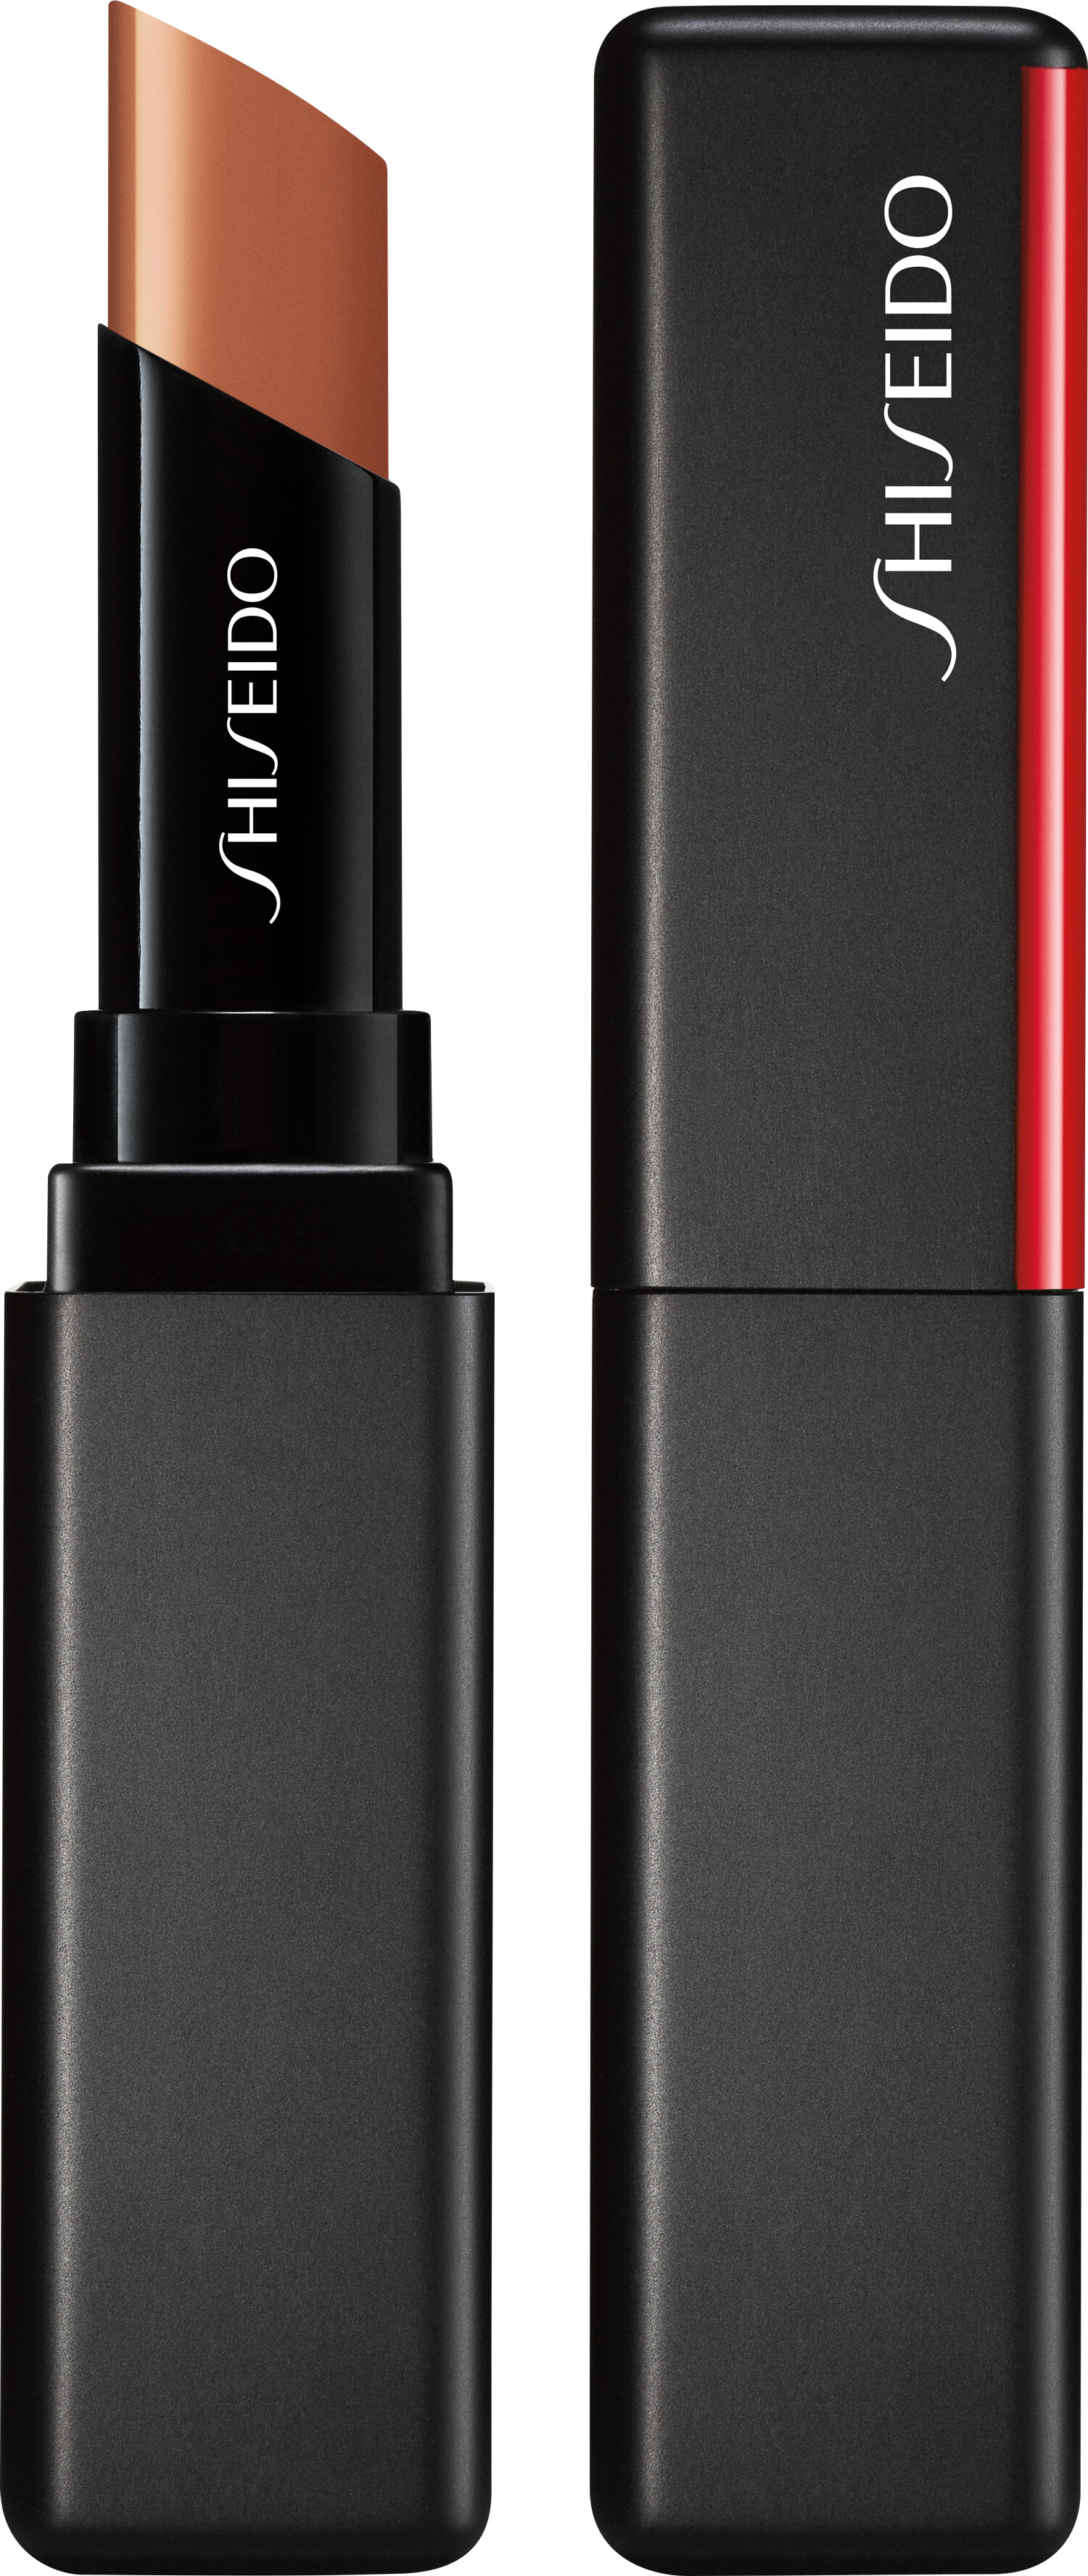 Shiseido VisionAiry Gel Lipstick 1.6g 201 - Cyber Beige